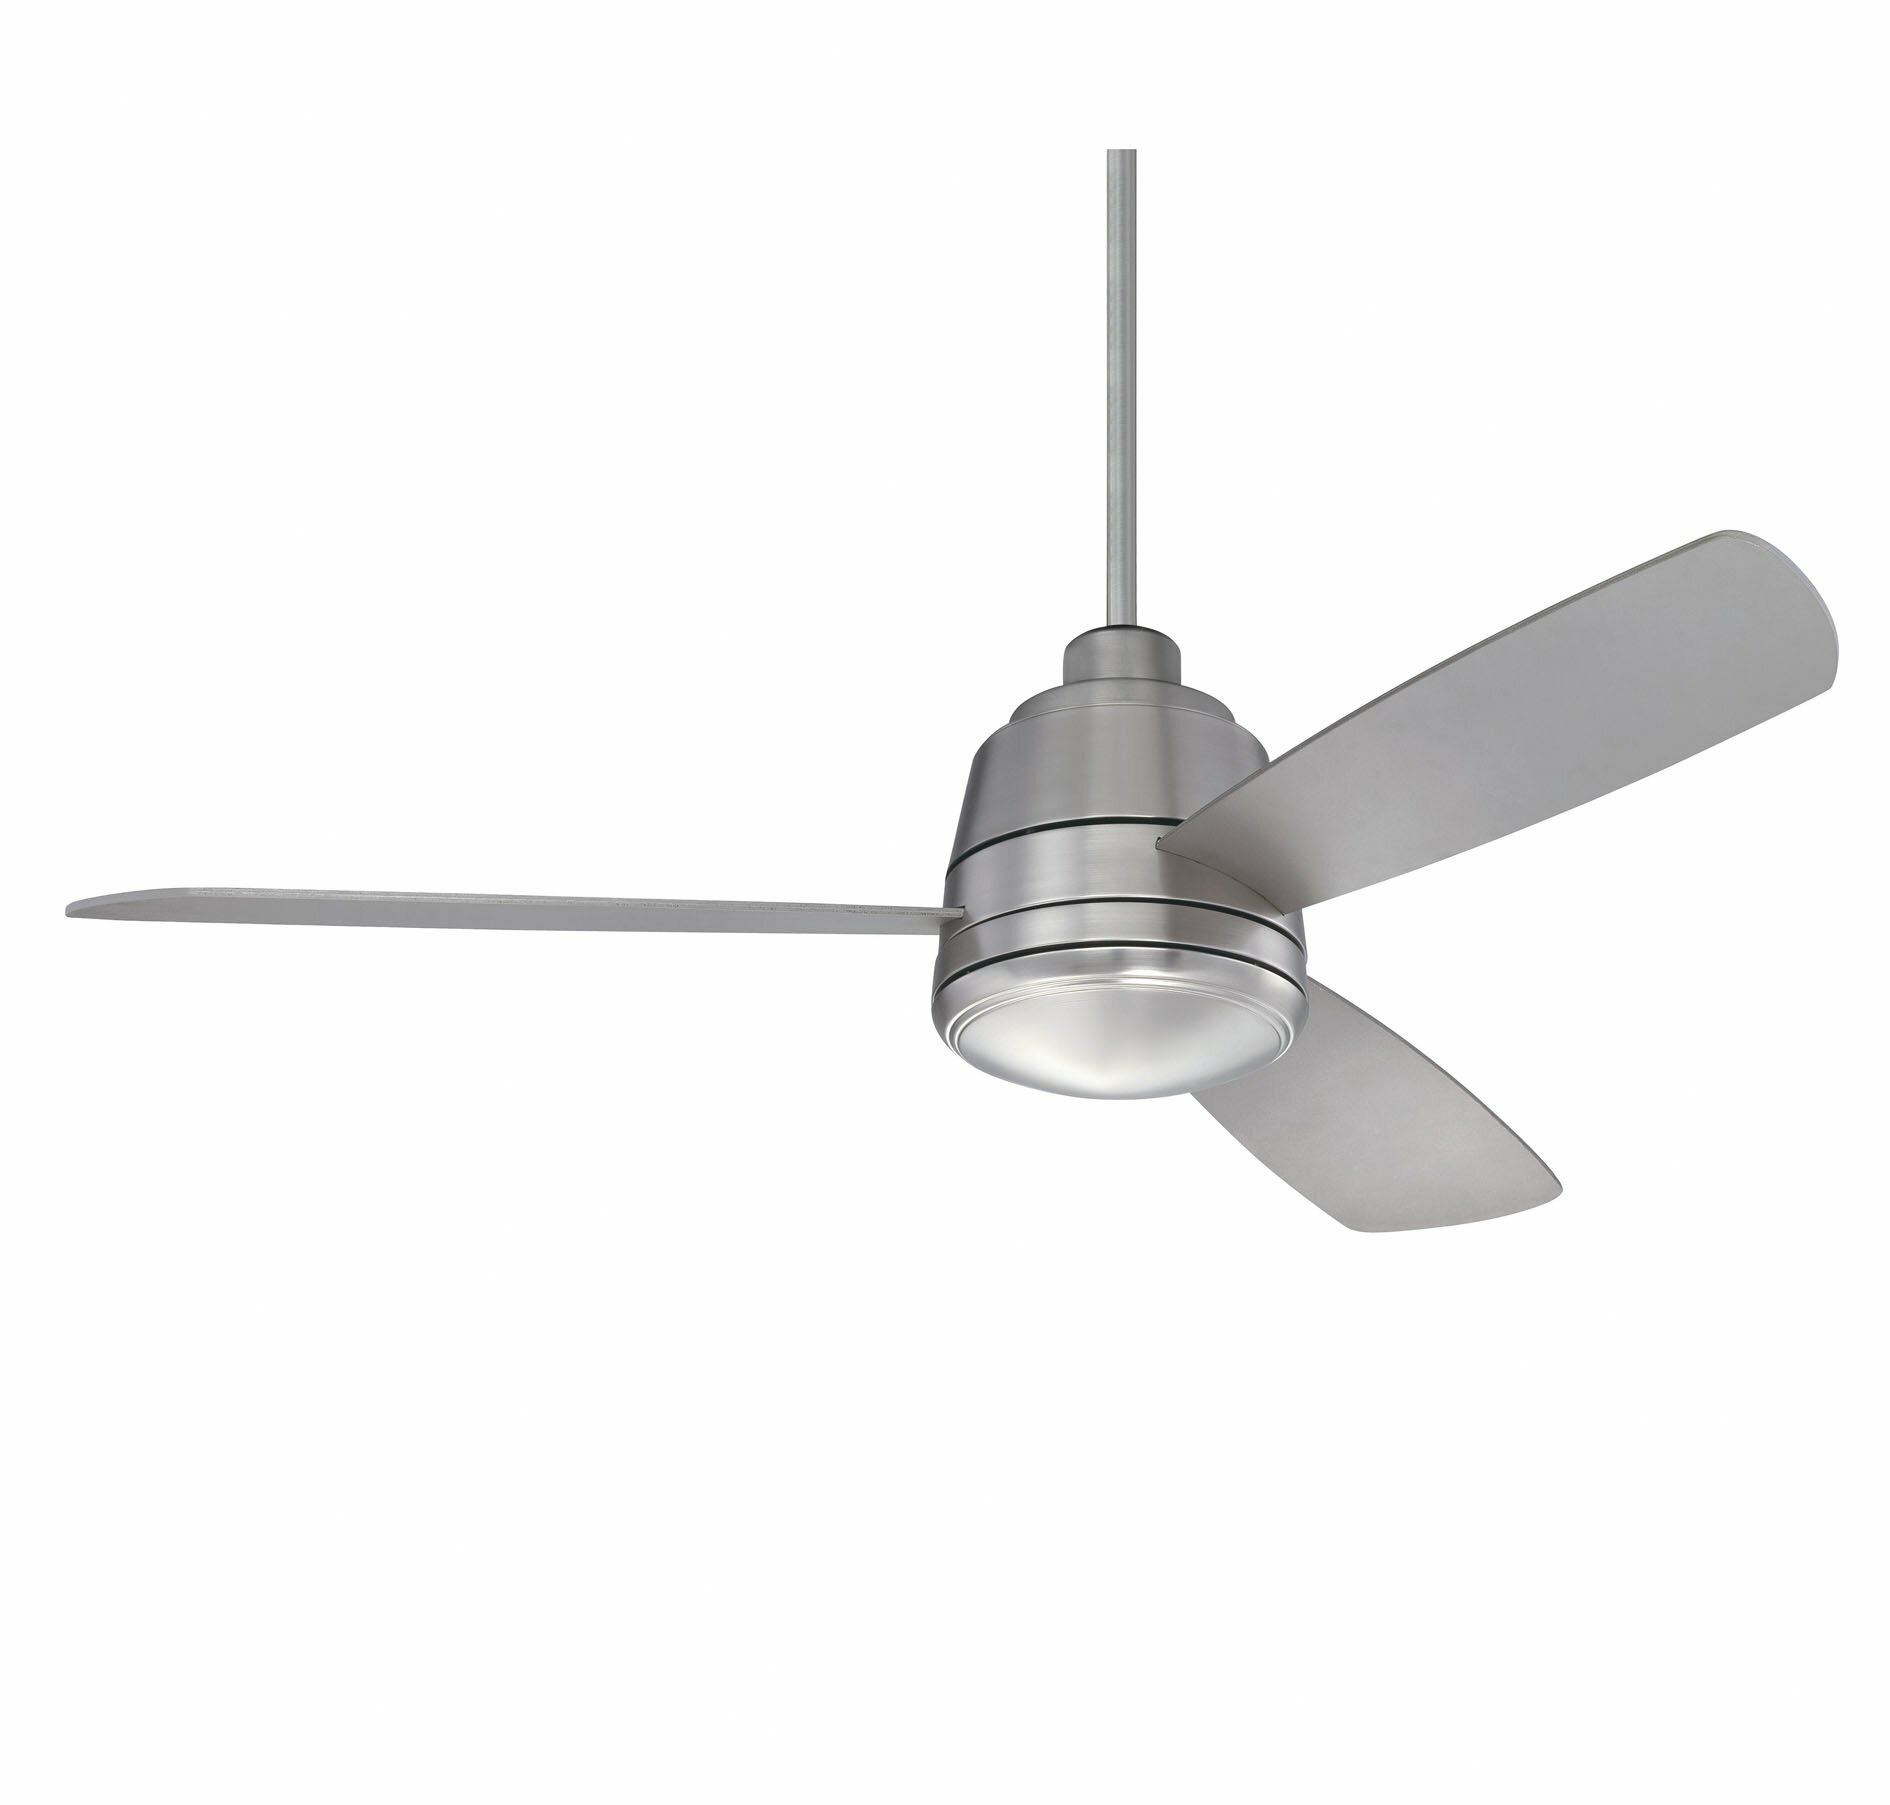 "Mercury Row Melanthios 52"" 3 Blade Ceiling Fan with Remote"